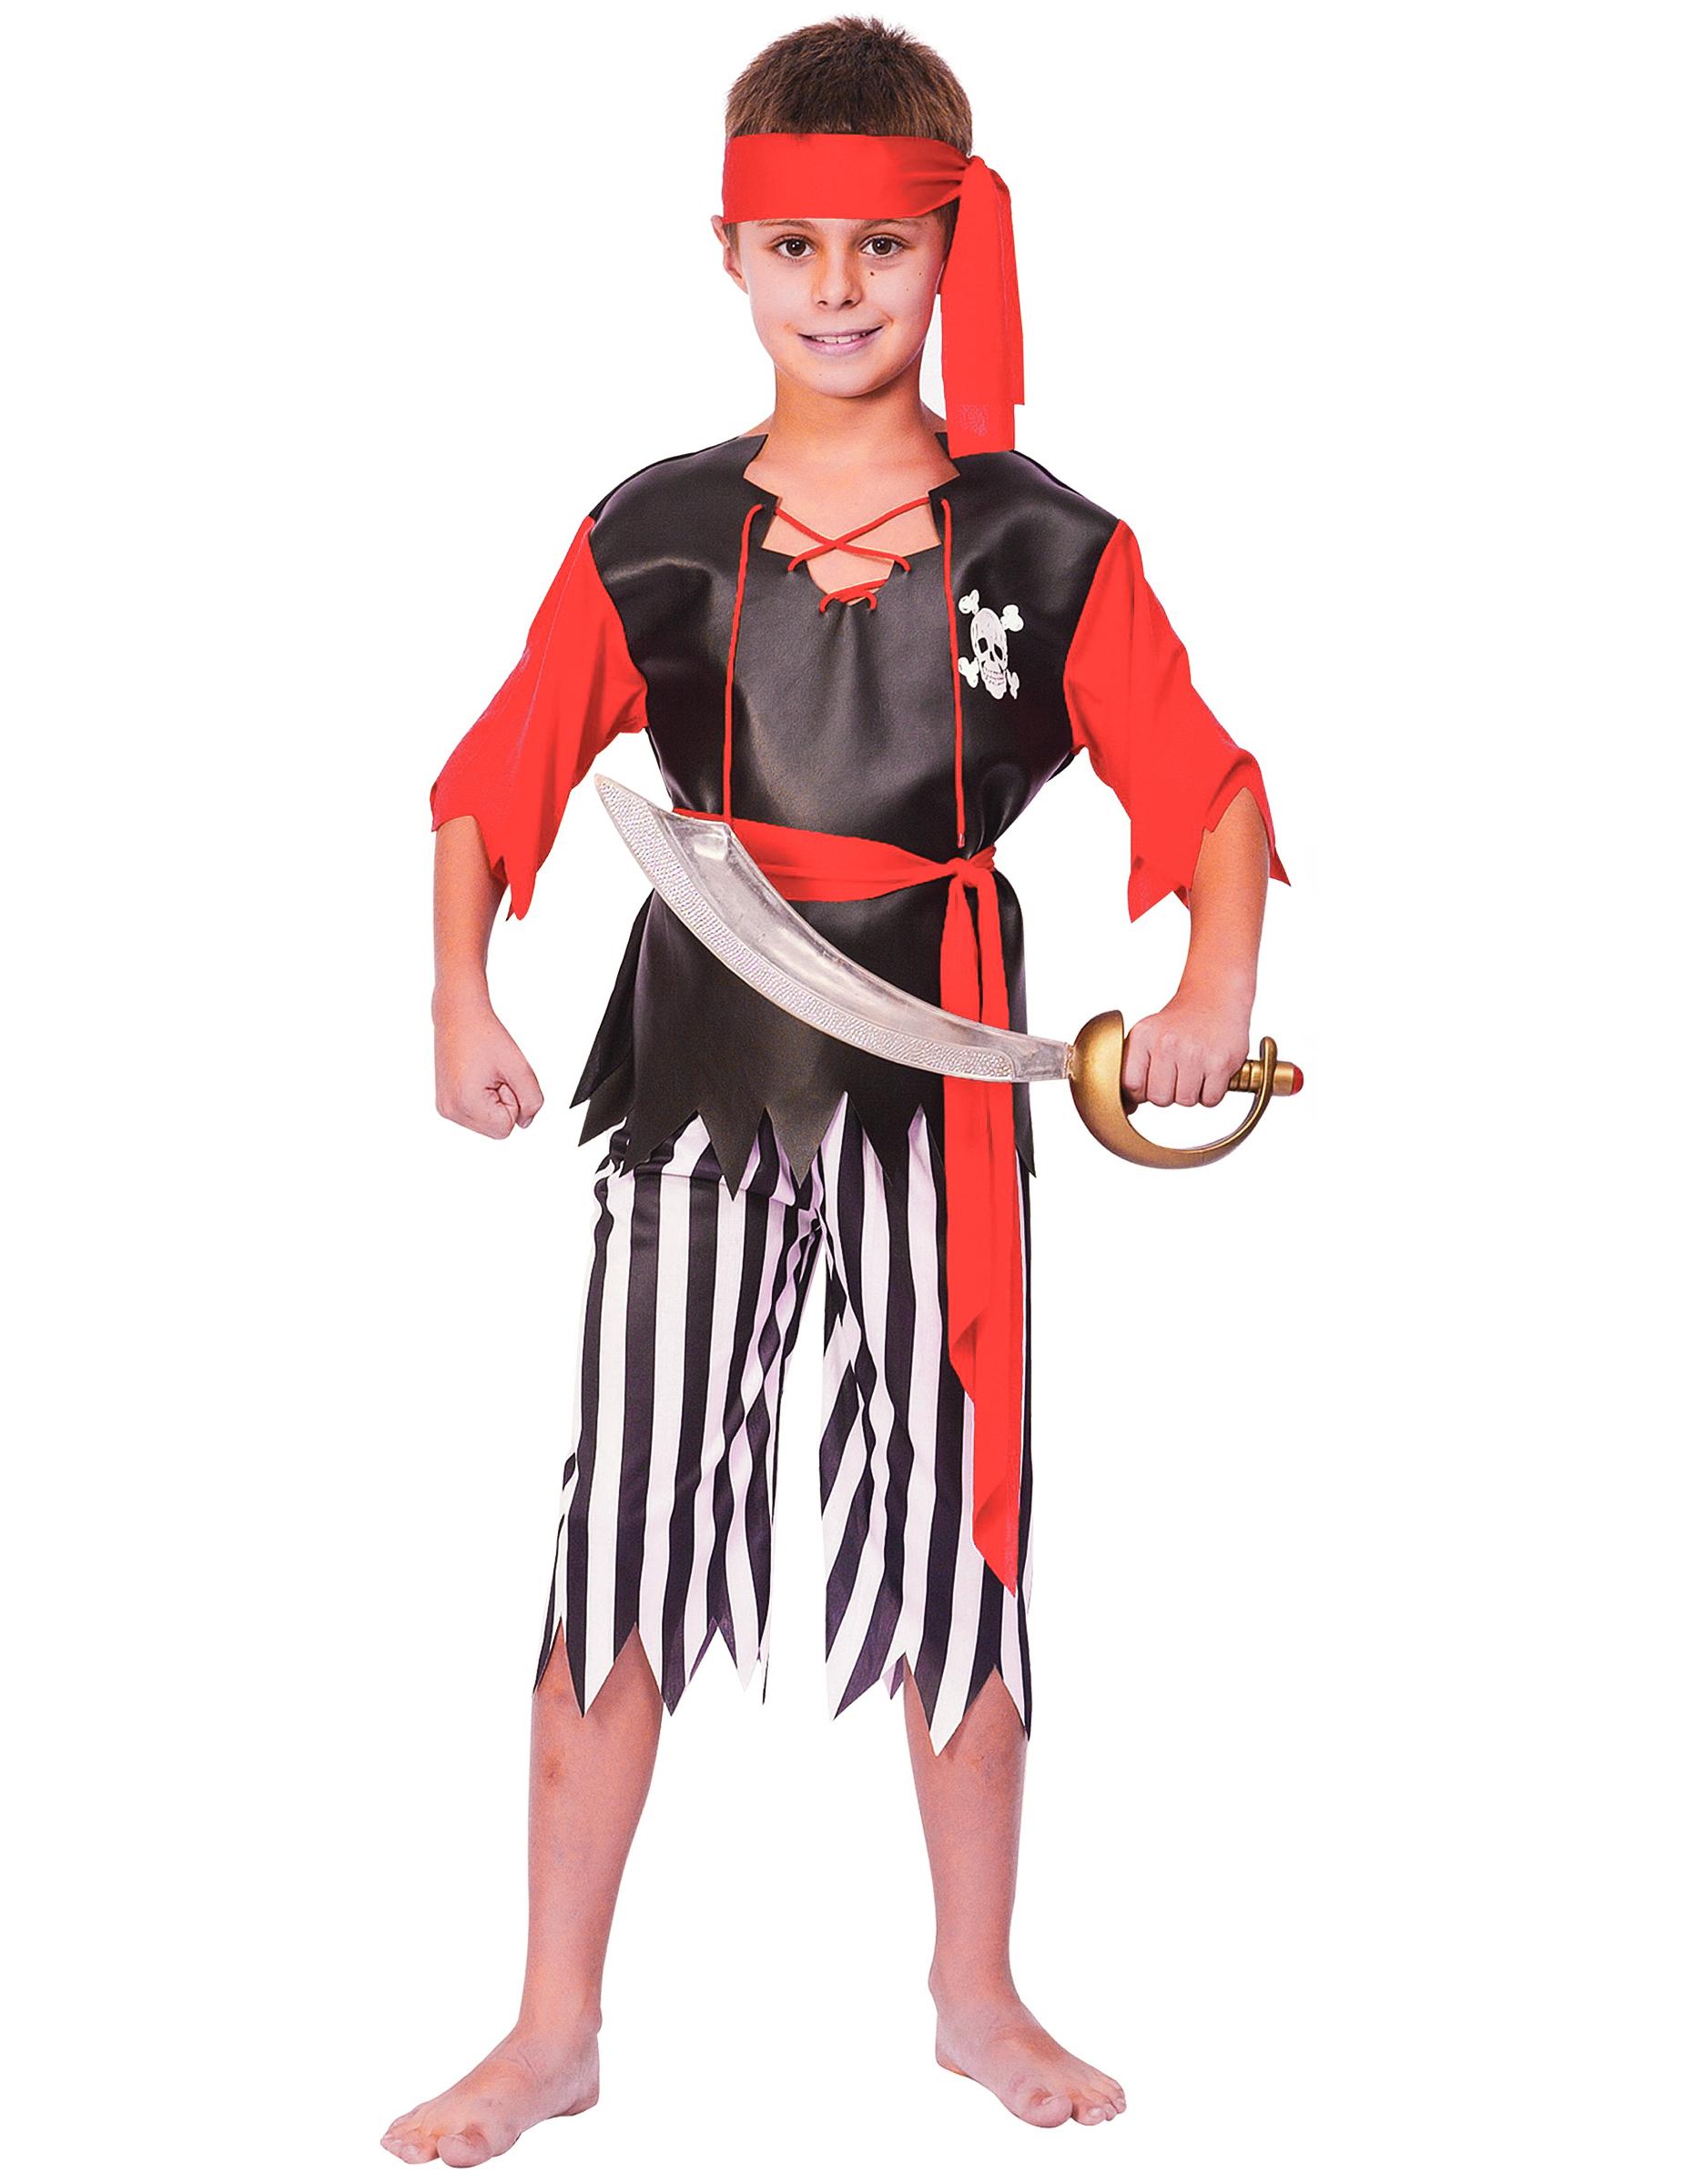 #Piraten Jungenkostüm schwarz-weiss-rot#